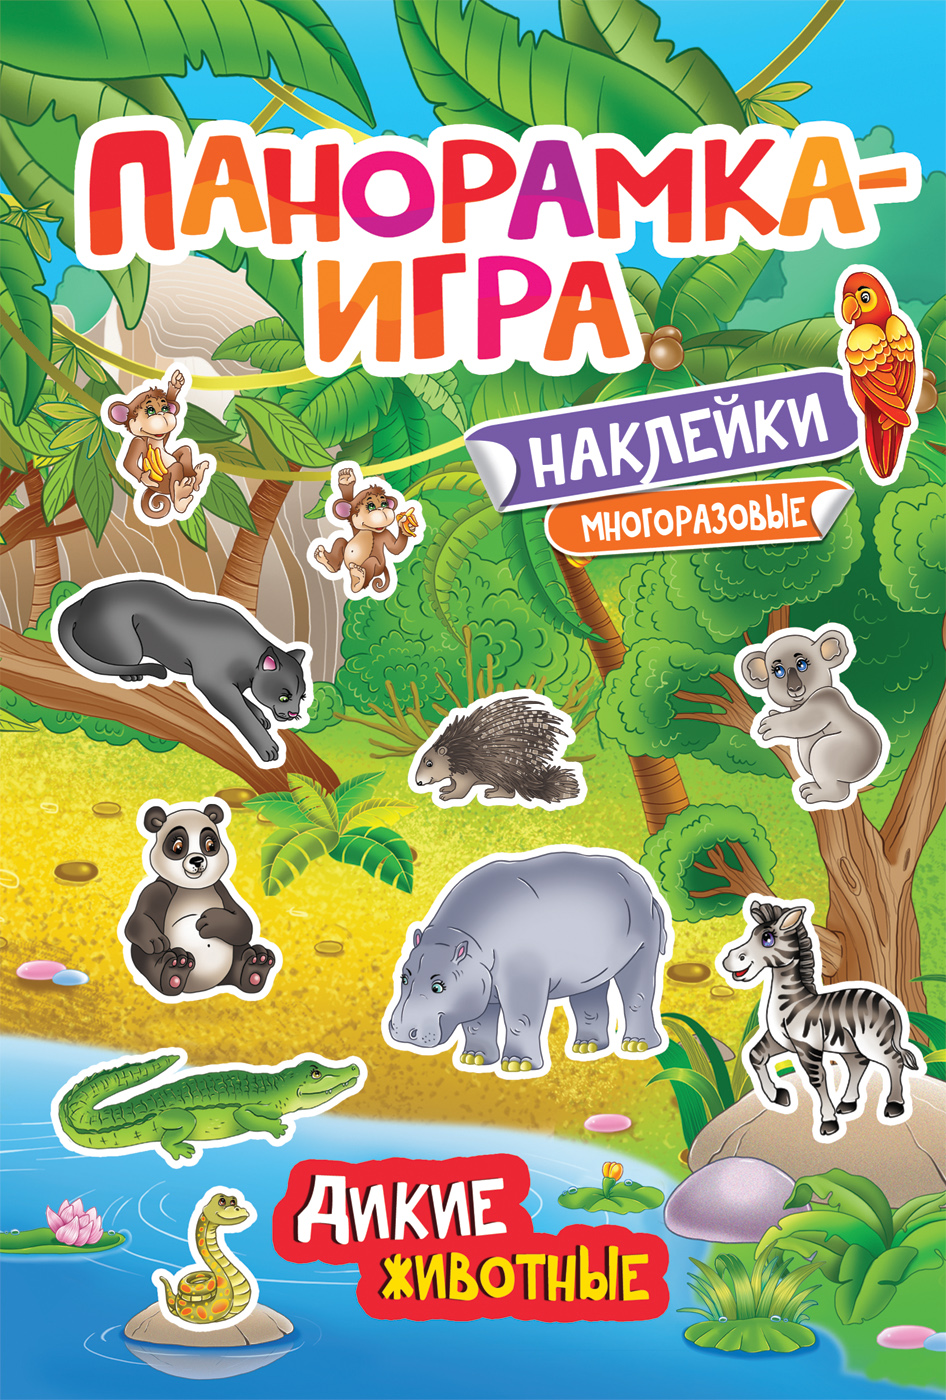 Котятова Н. И. Панорамка-игра. Дикие животные